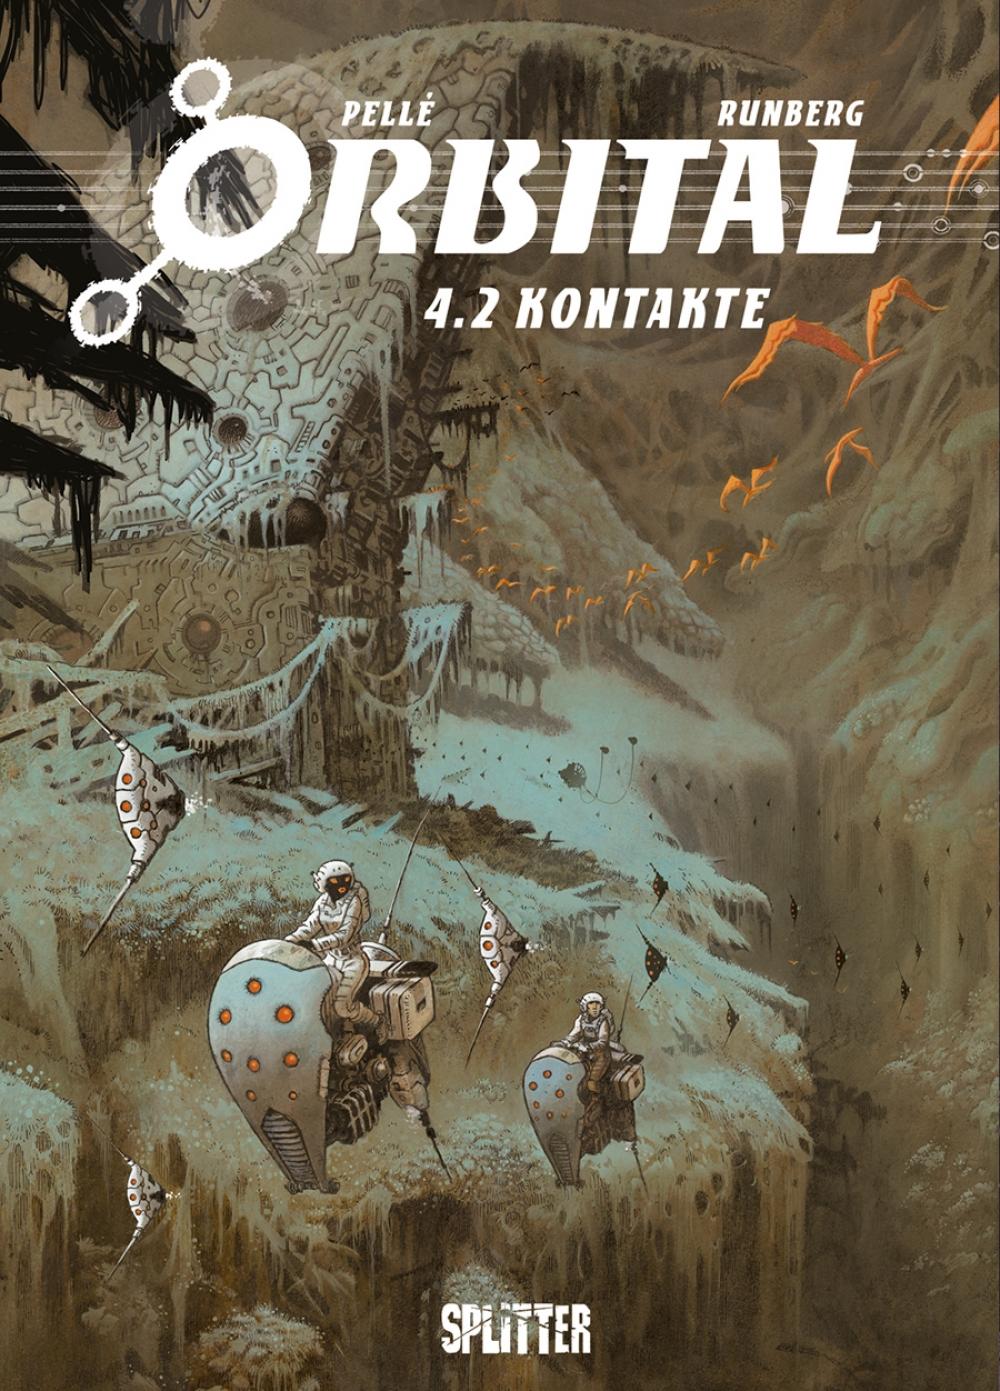 Orbital 4.2 : Kontakte